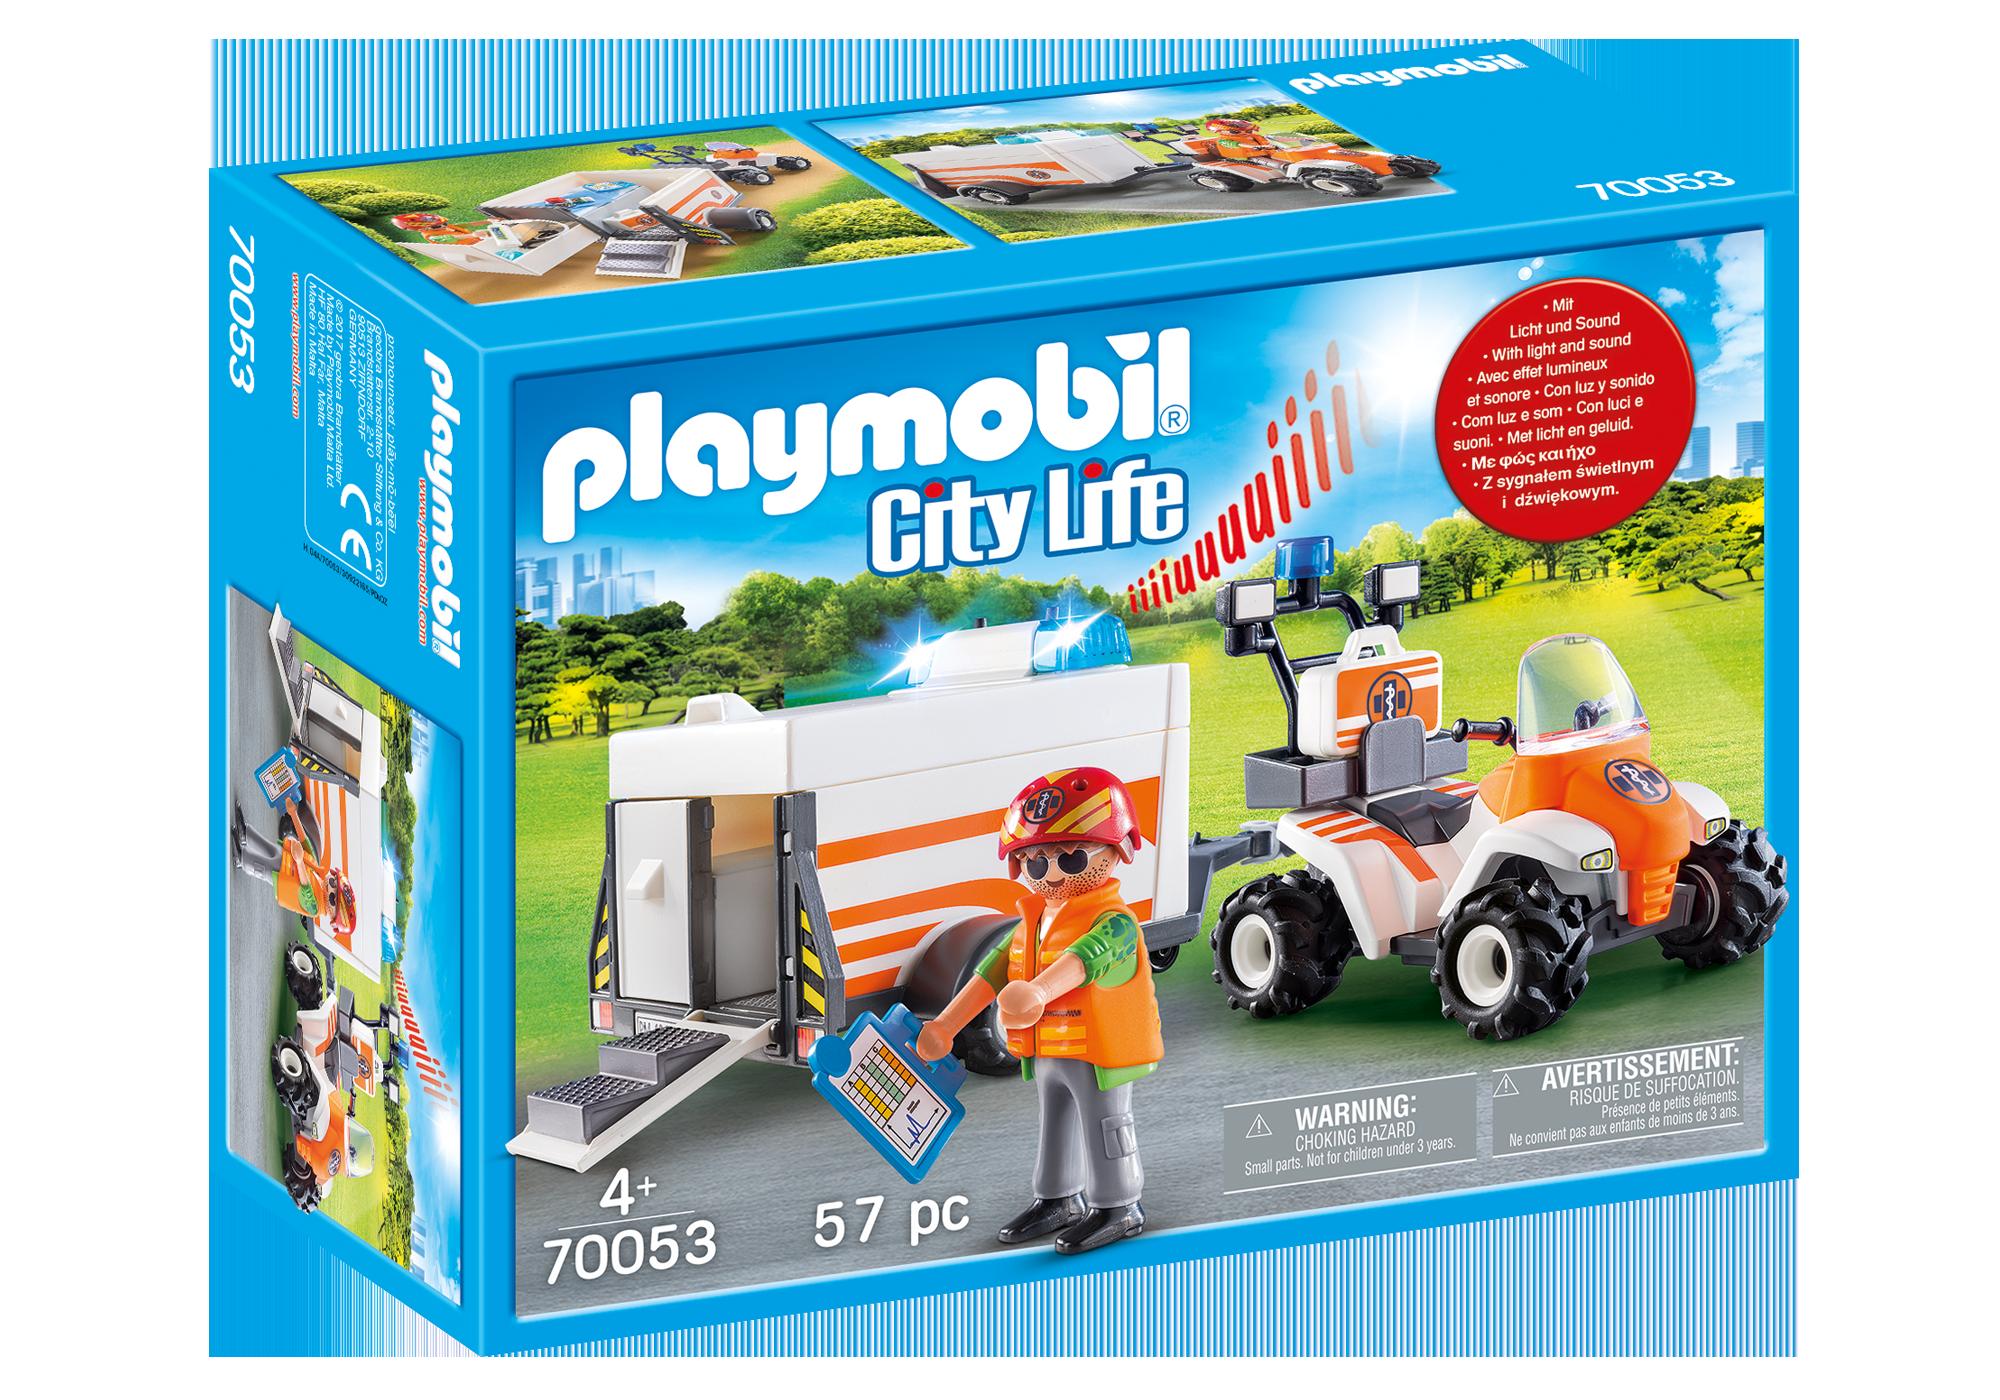 http://media.playmobil.com/i/playmobil/70053_product_box_front/Quad soccorso con carrello